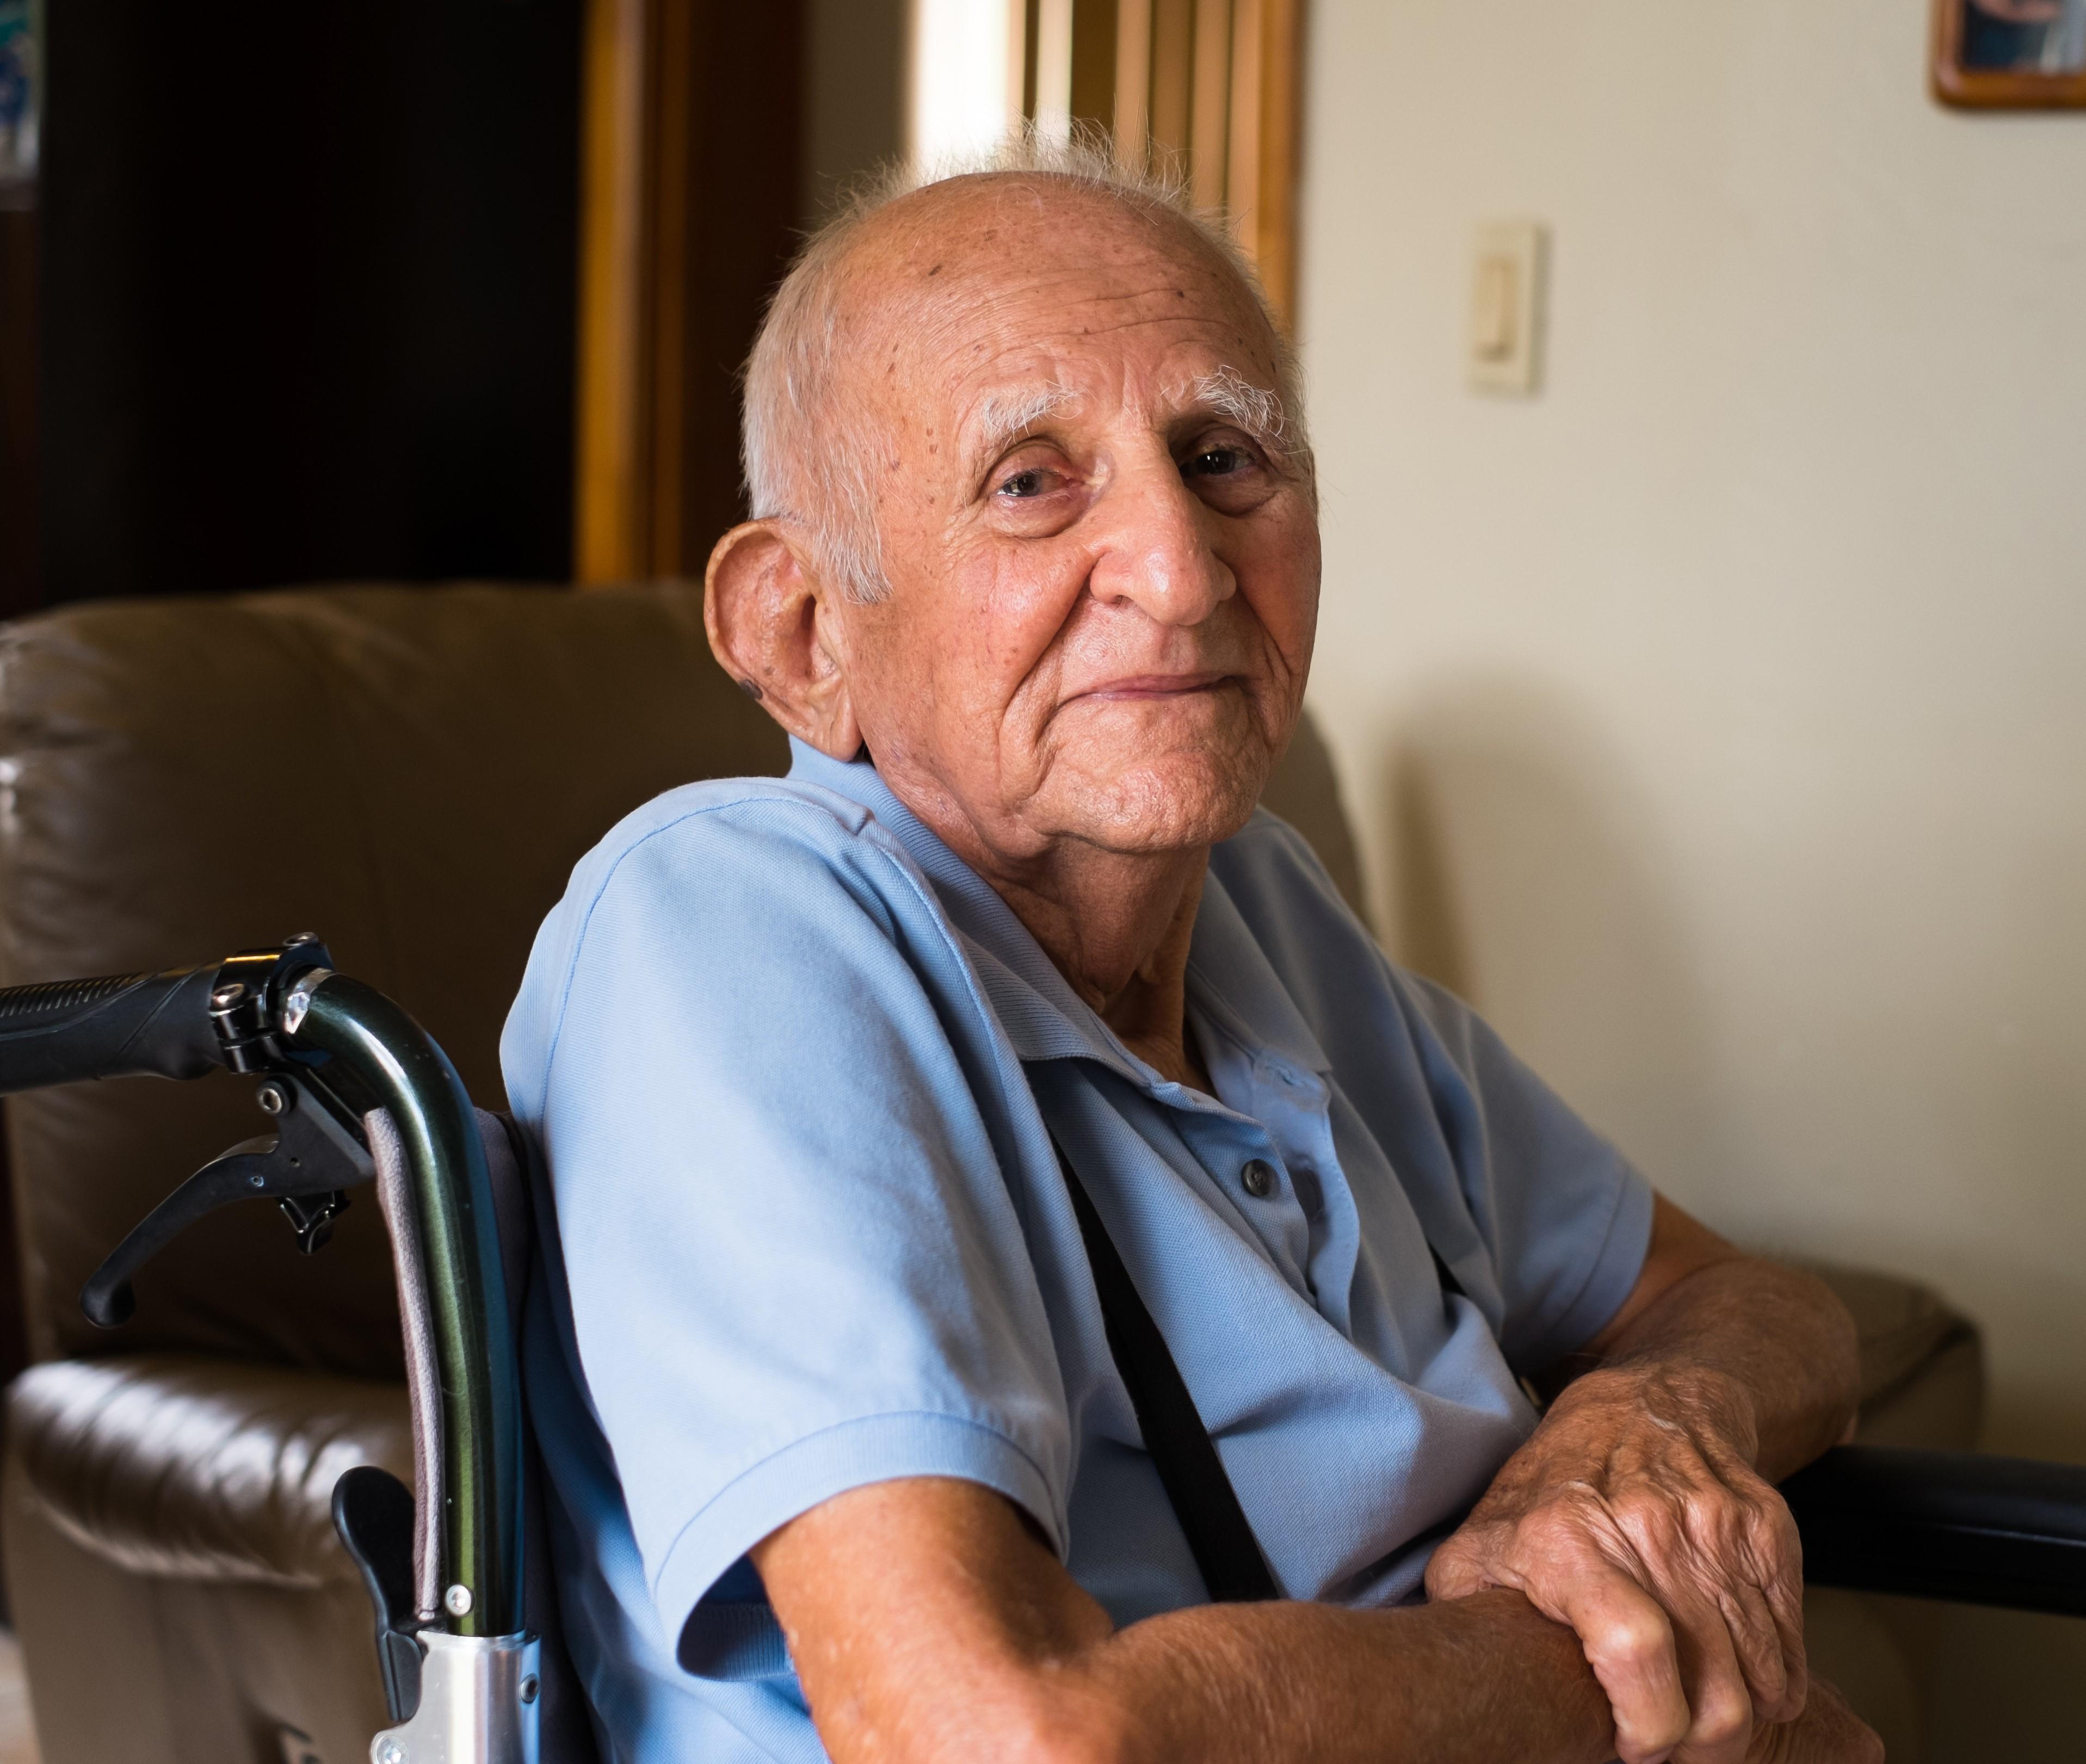 Older man siting